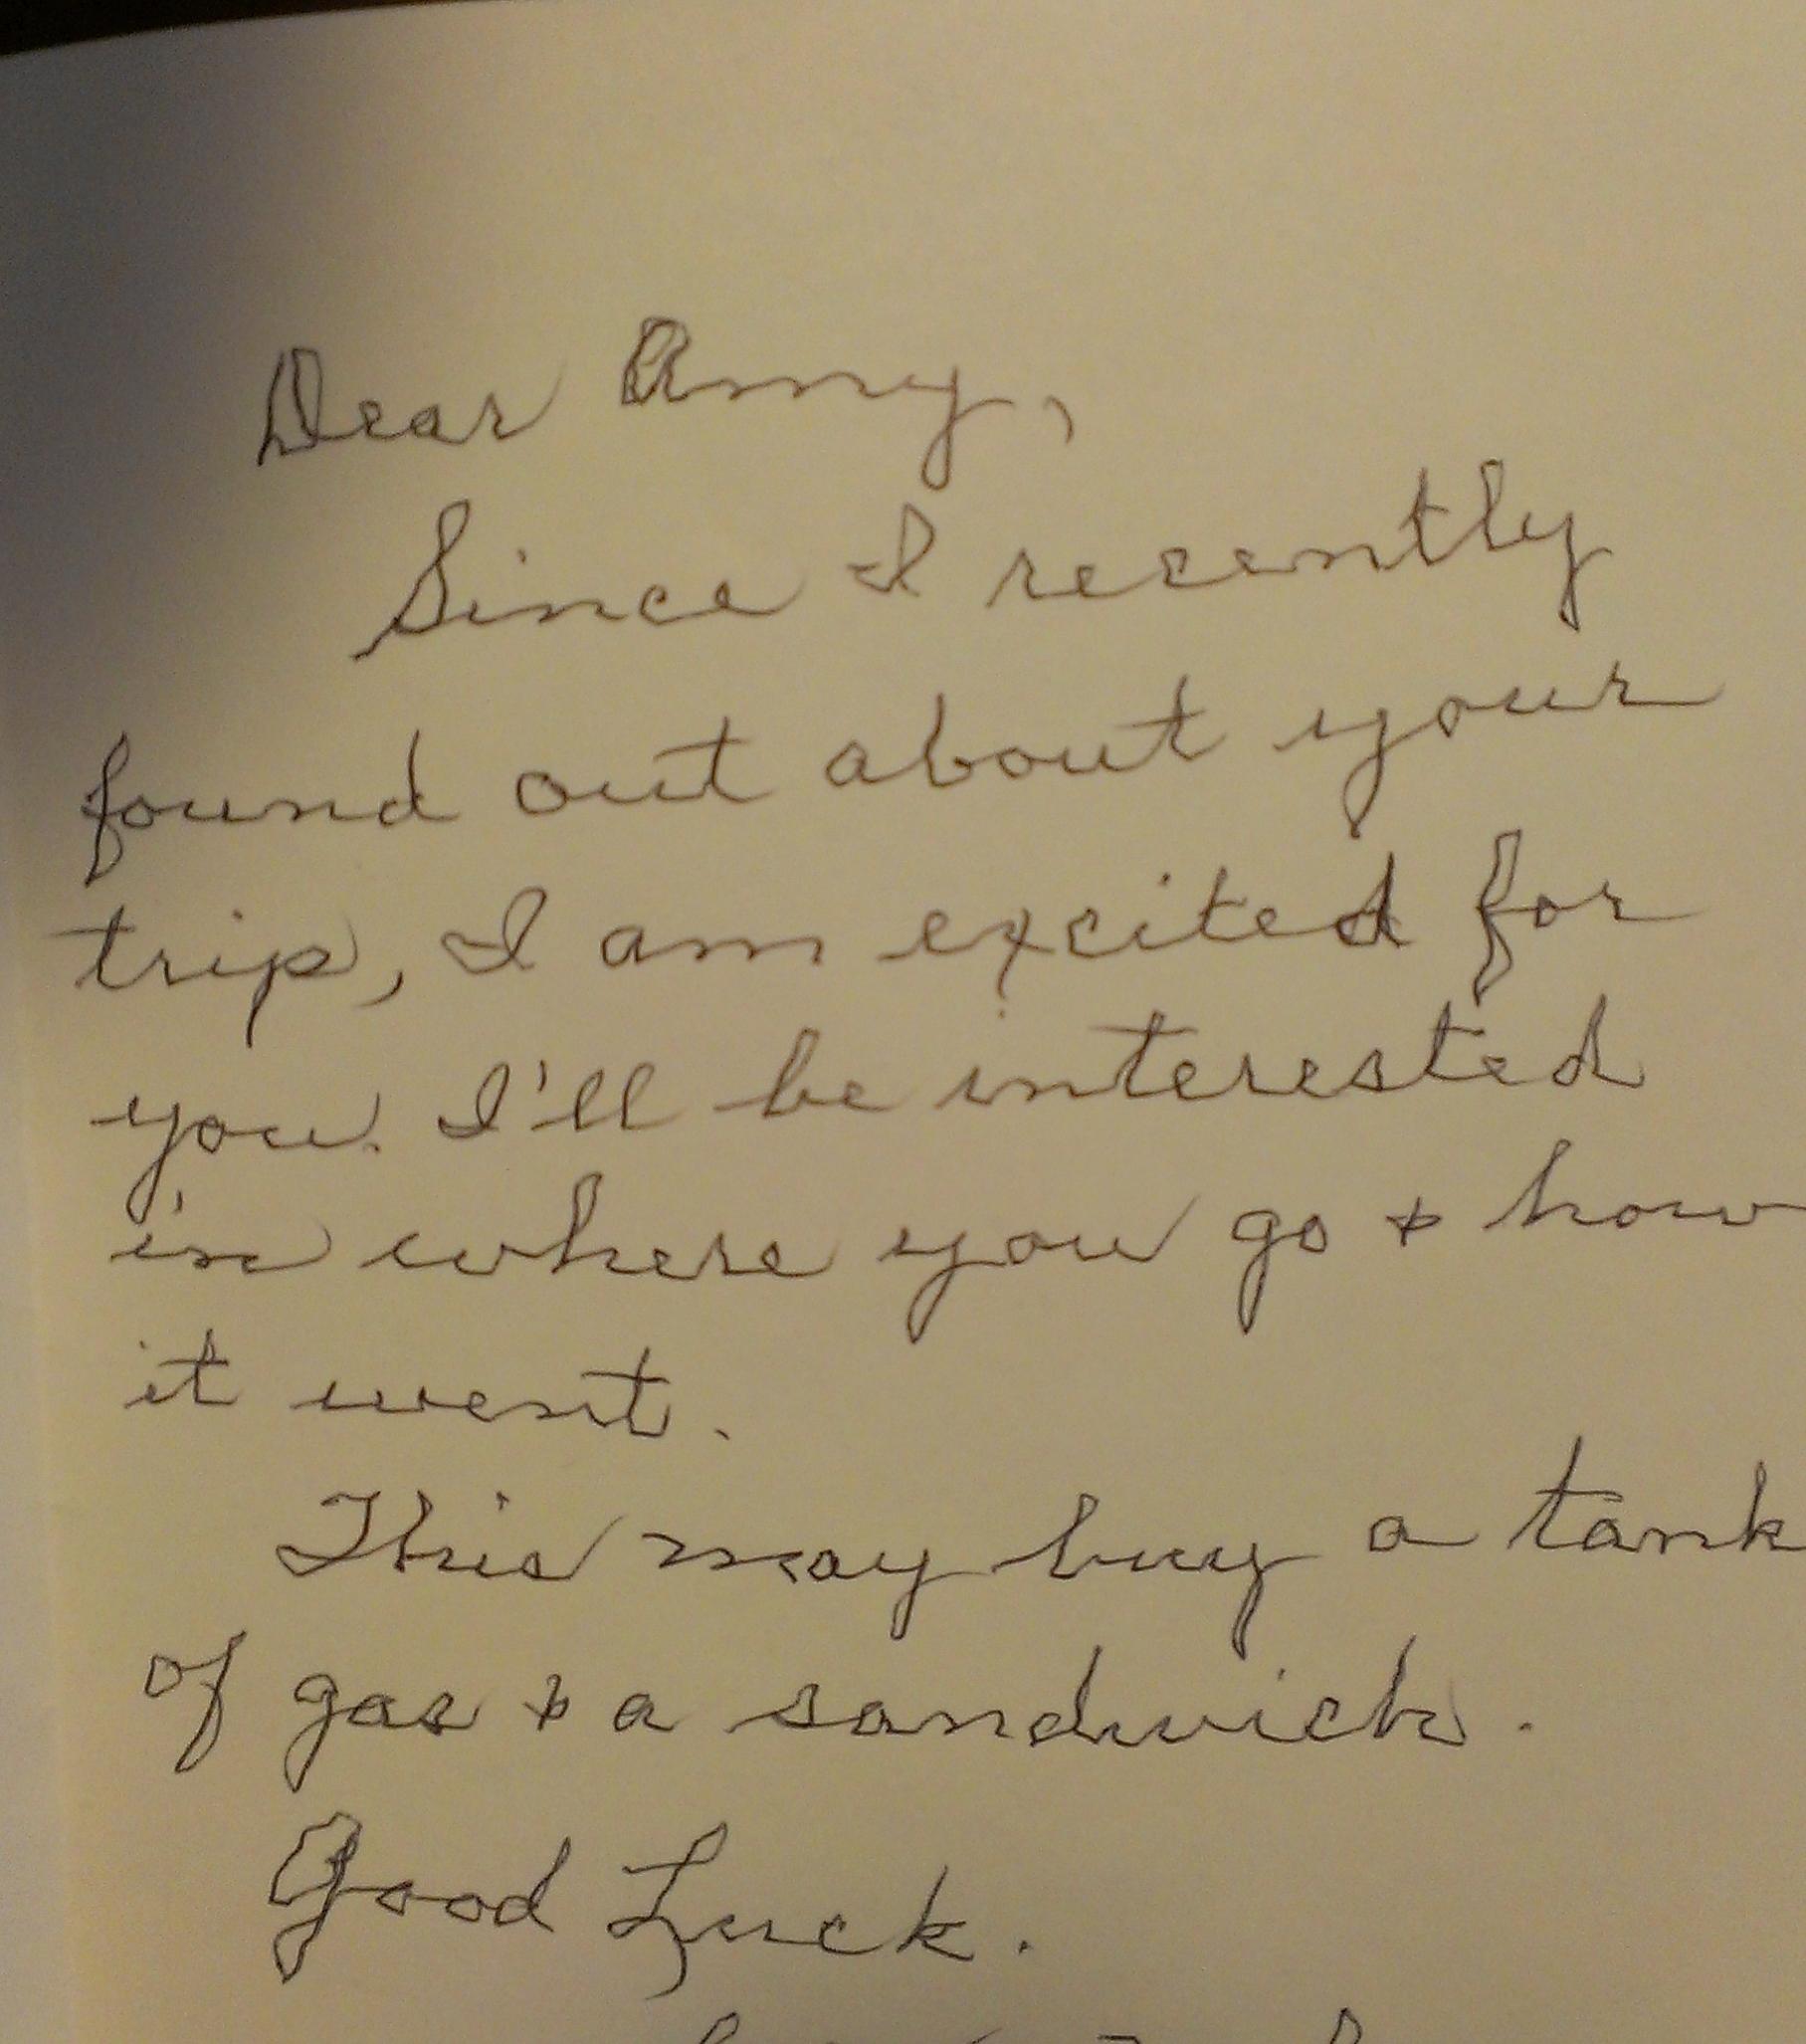 LaVon's card